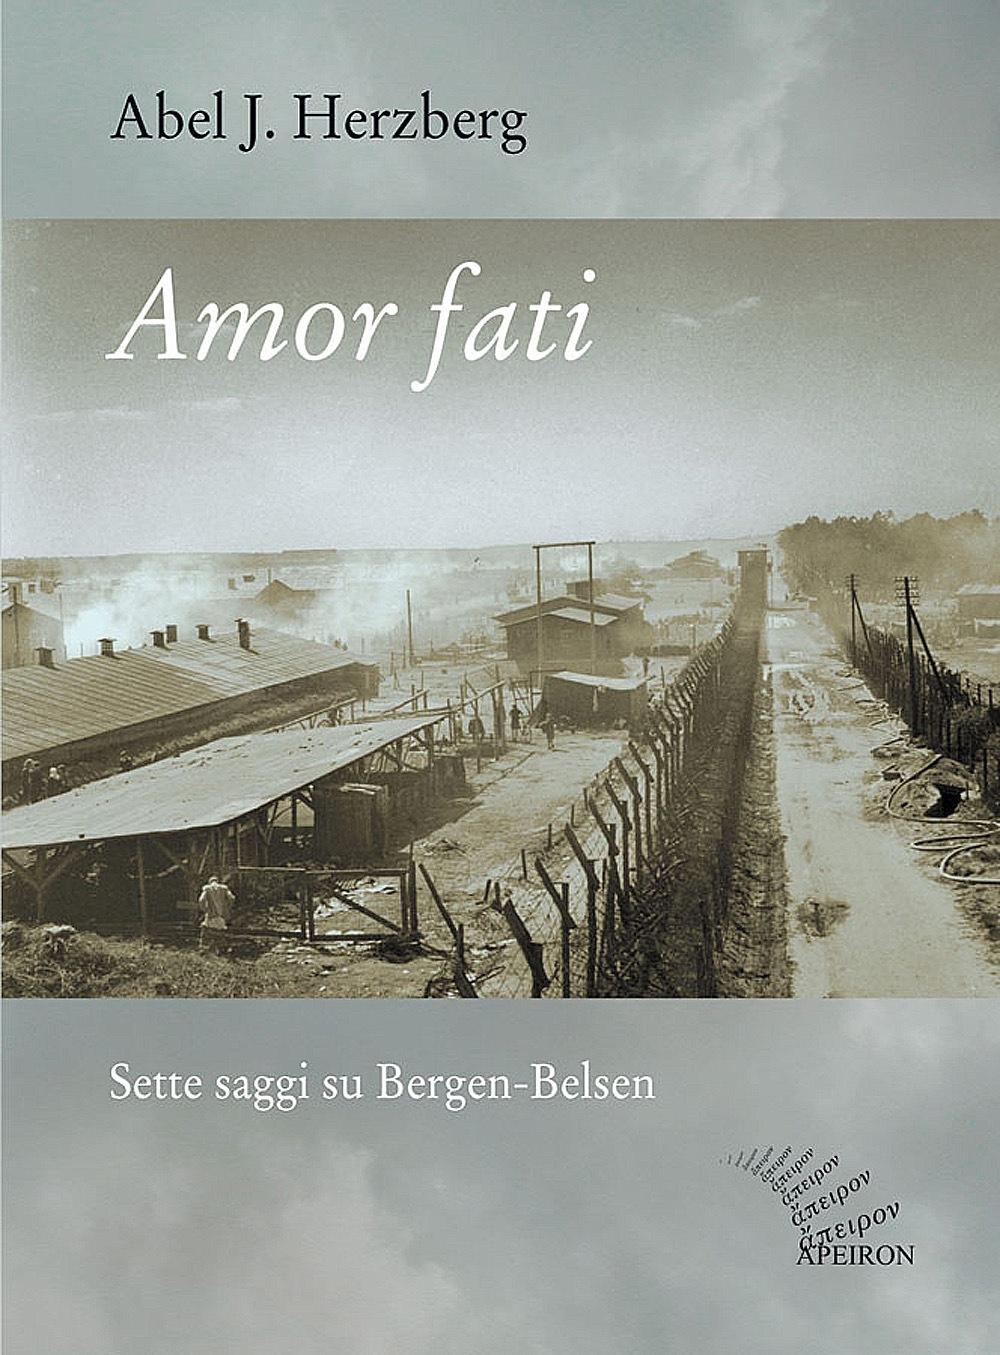 Amor fati. Sette saggi su Bergen-Belsen